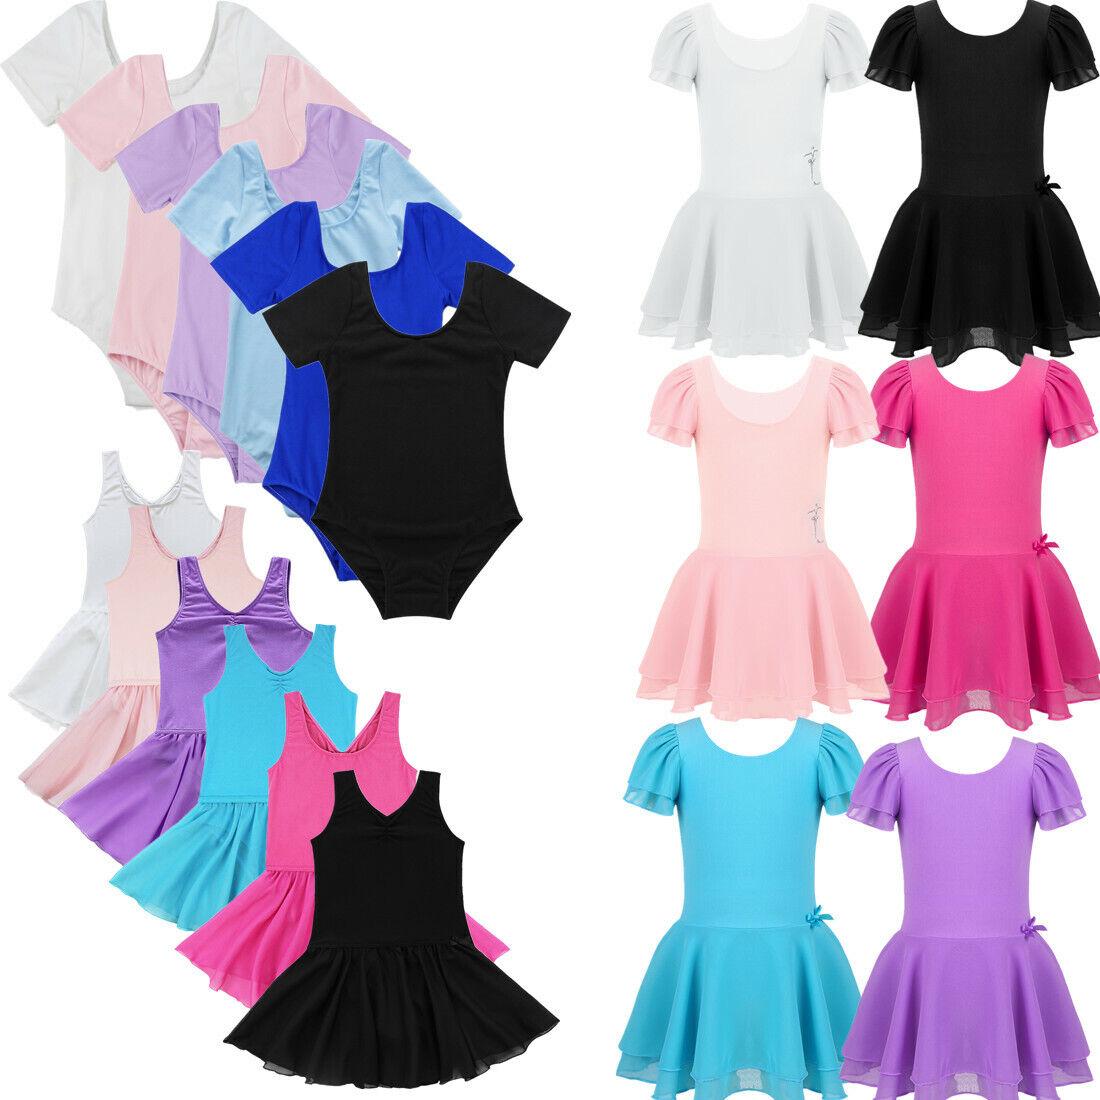 Kids Girls Ballet Dance Leotard Dress Tutu Skirts Gymnastics Dancewear Costume